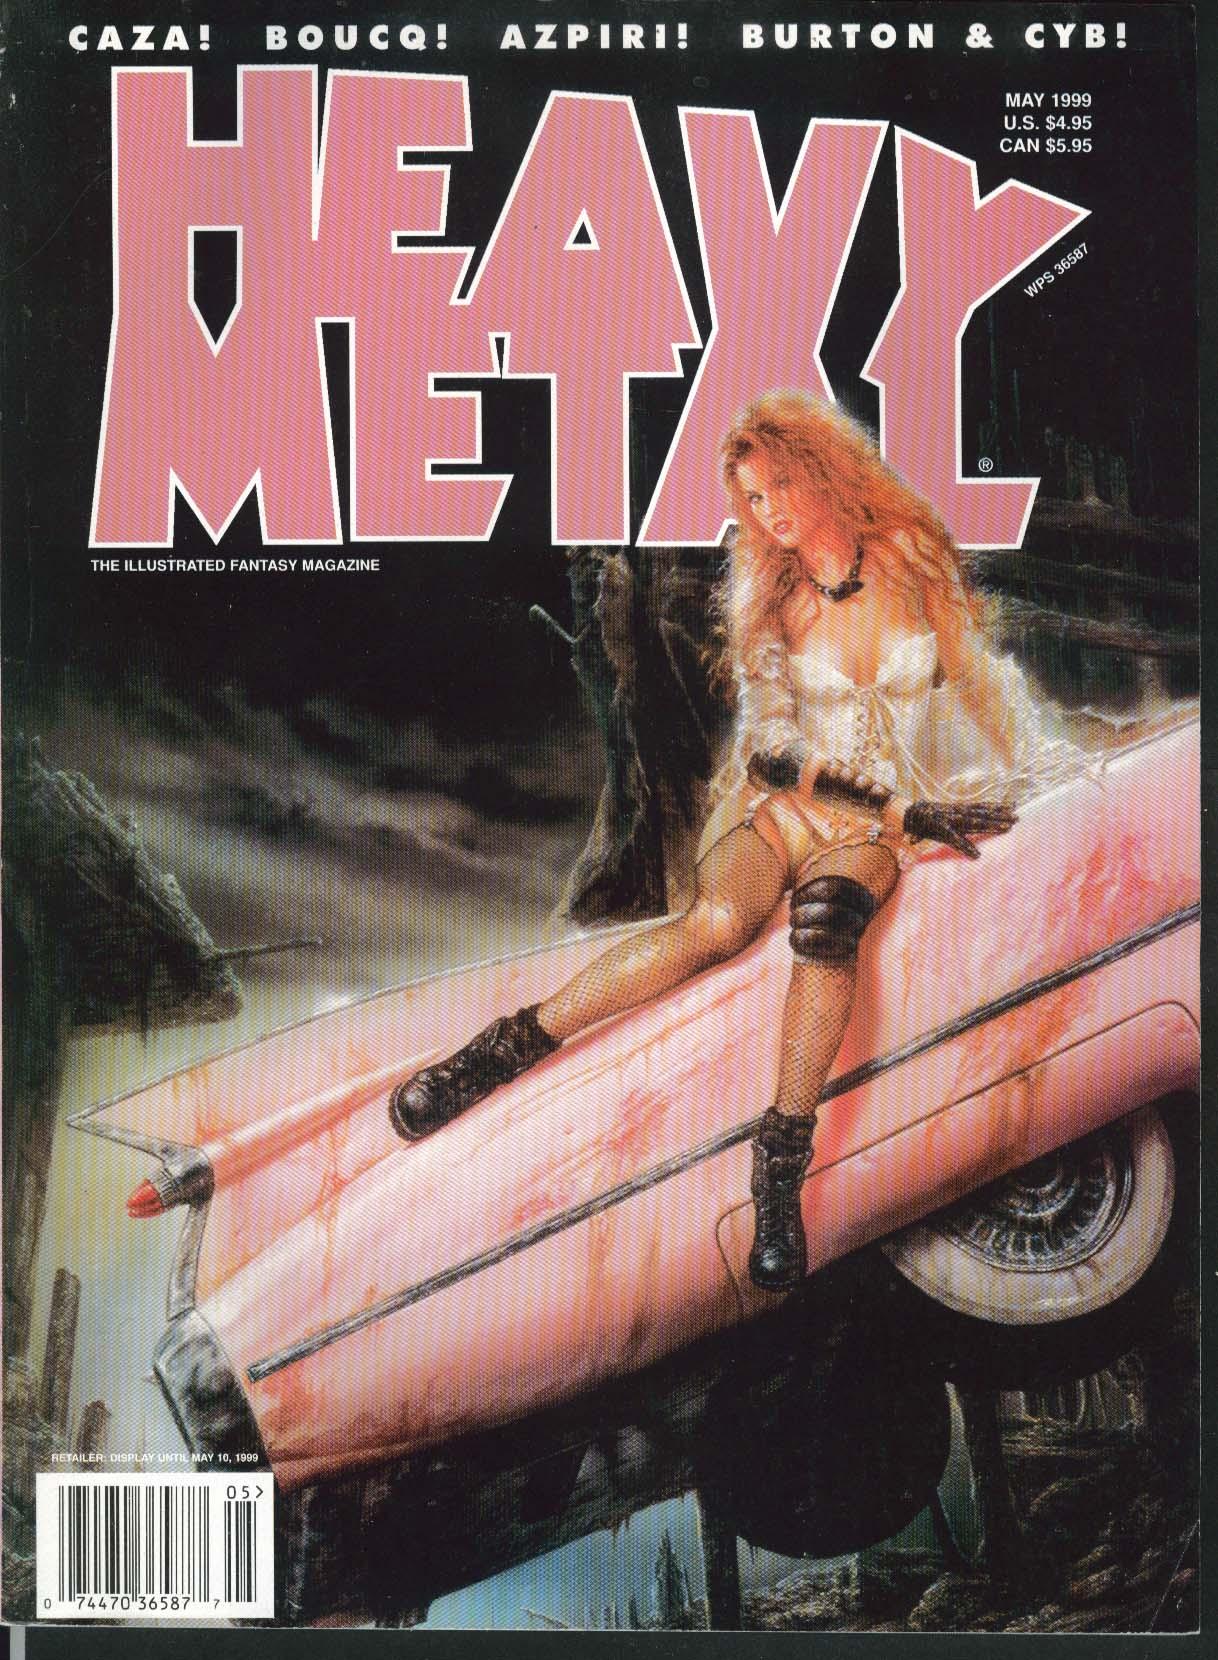 HEAVY METAL Caza Boucq Azpiri Burton Cyb Luis Royo 5 1999